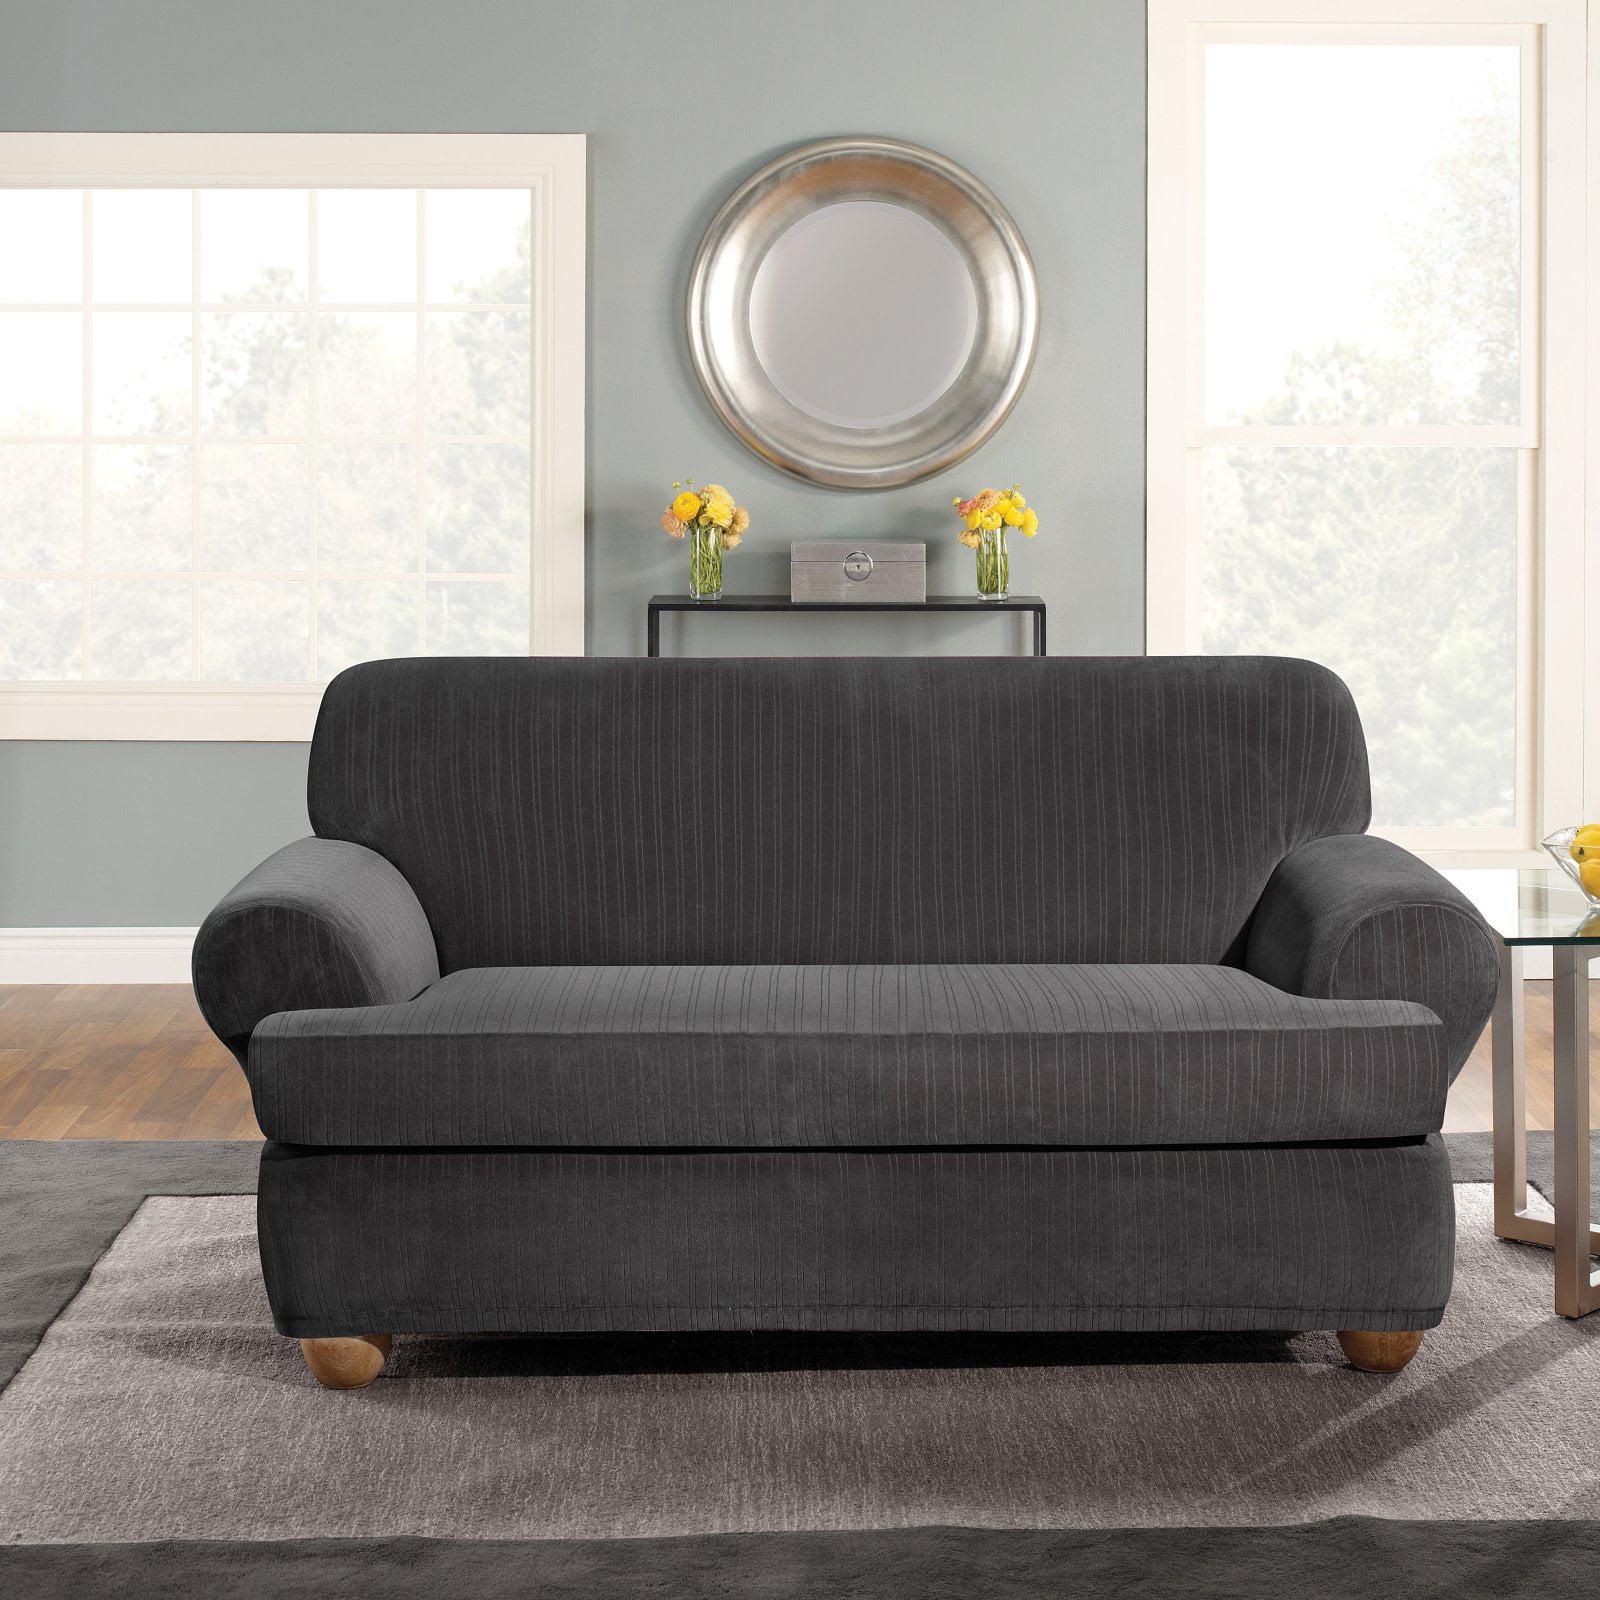 Surefit Stretch Pinstripe 2 Piece T Cushion Sofa Slipcover Black